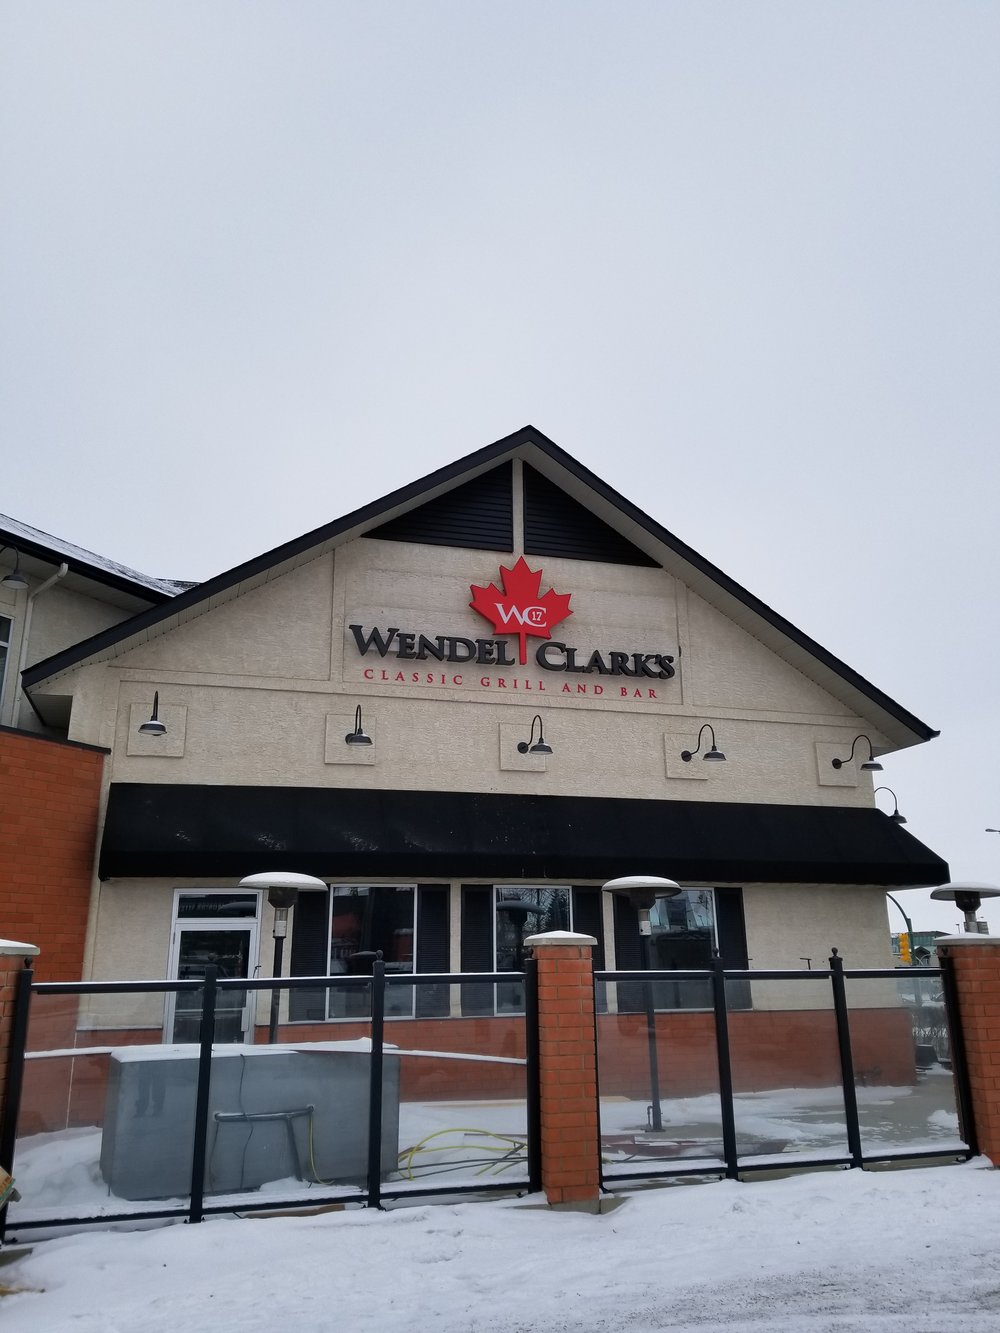 Wendel Clark's Classic Grill and Bar, Saskatoon